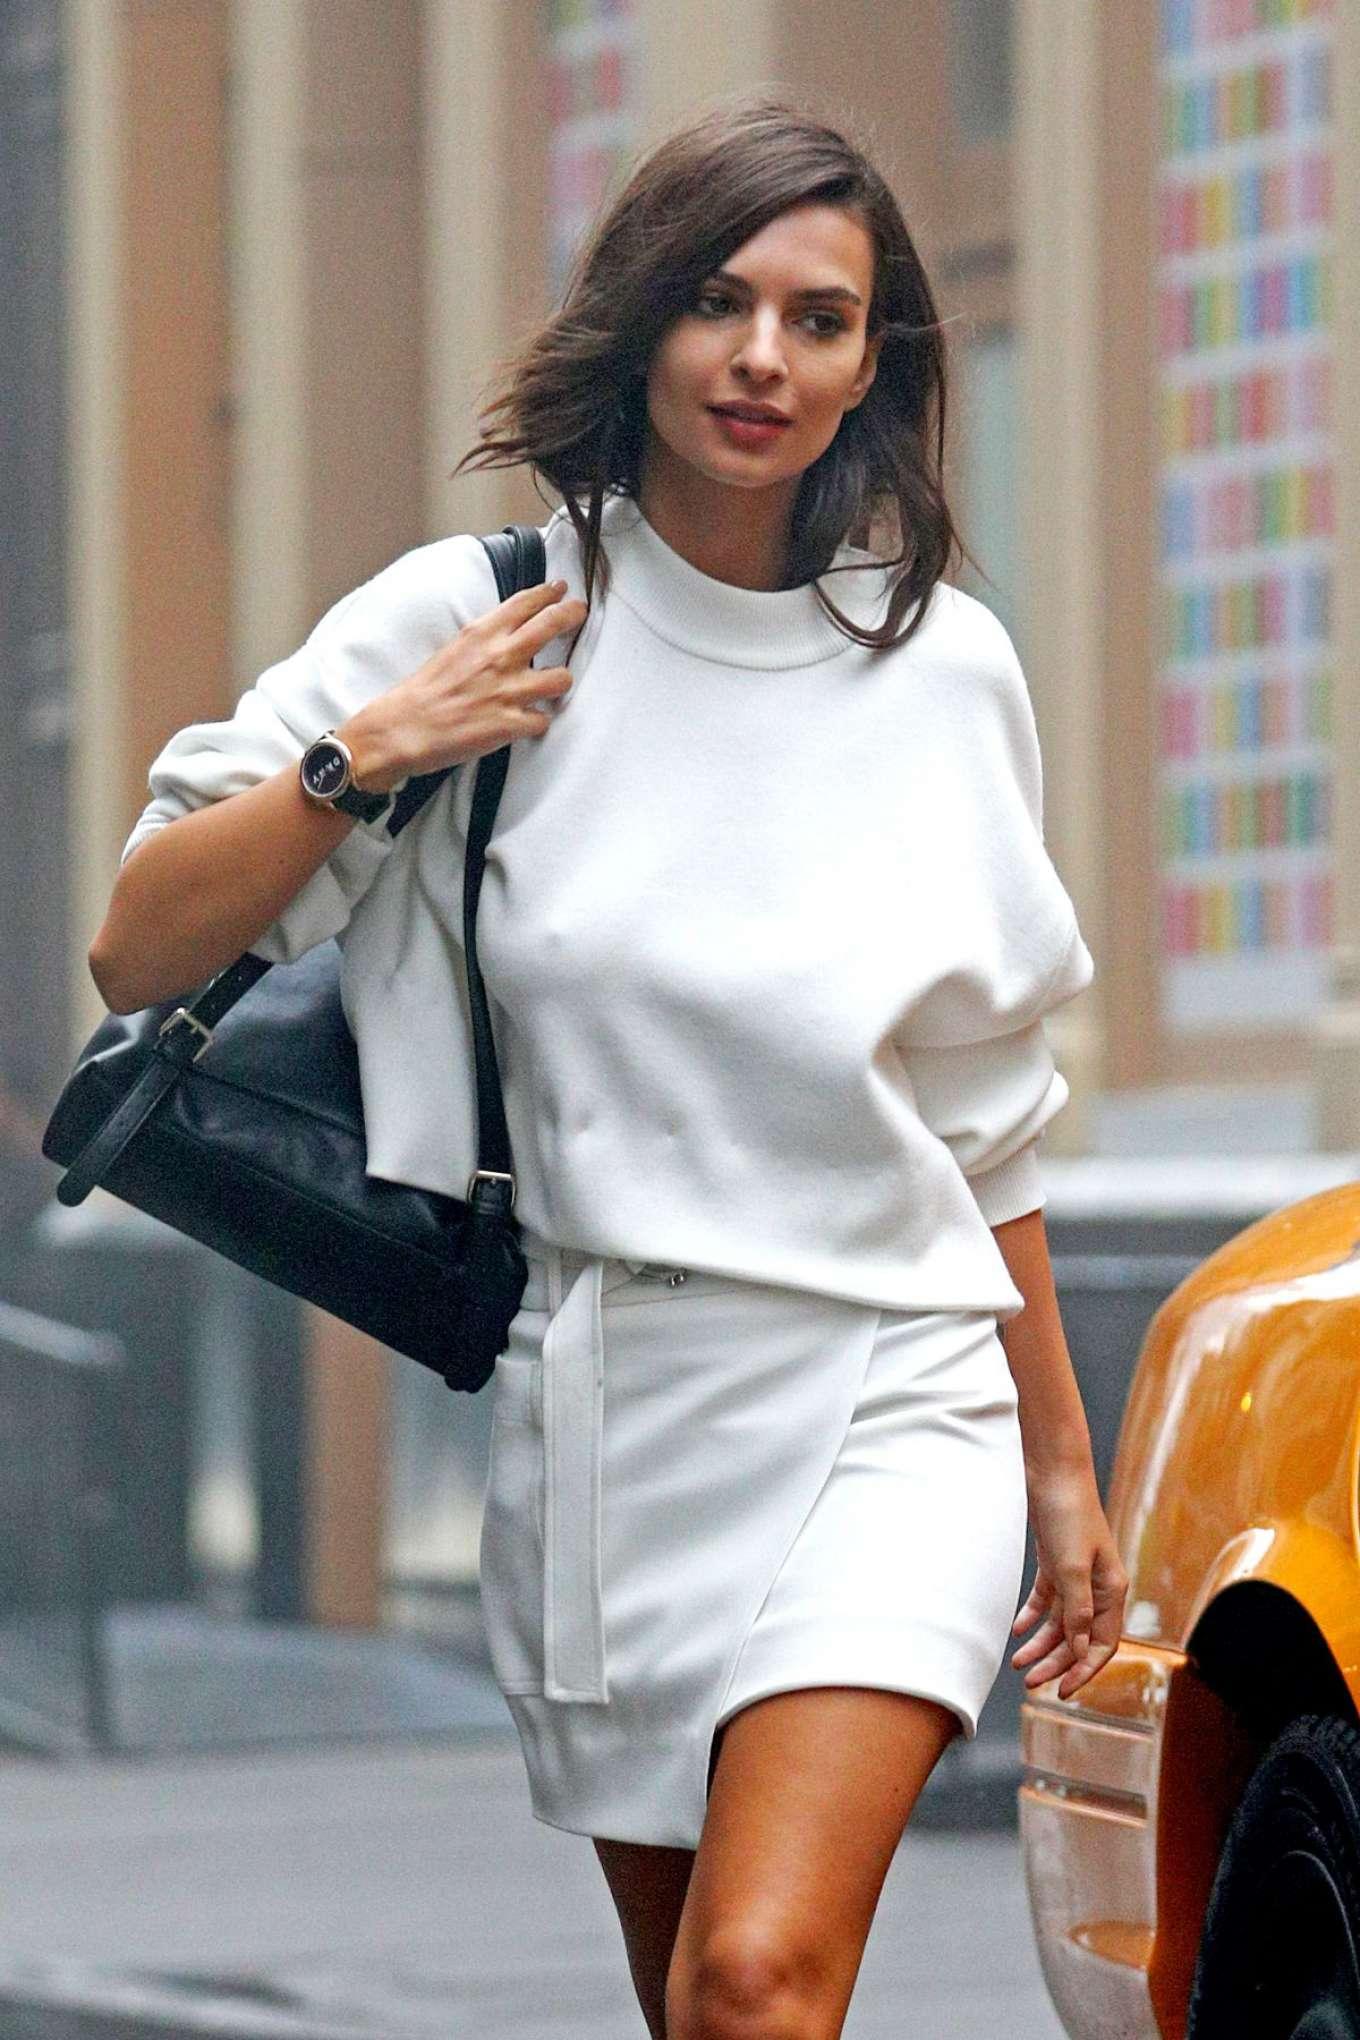 Emily Ratajkowski on DKNY Commercial set in New York